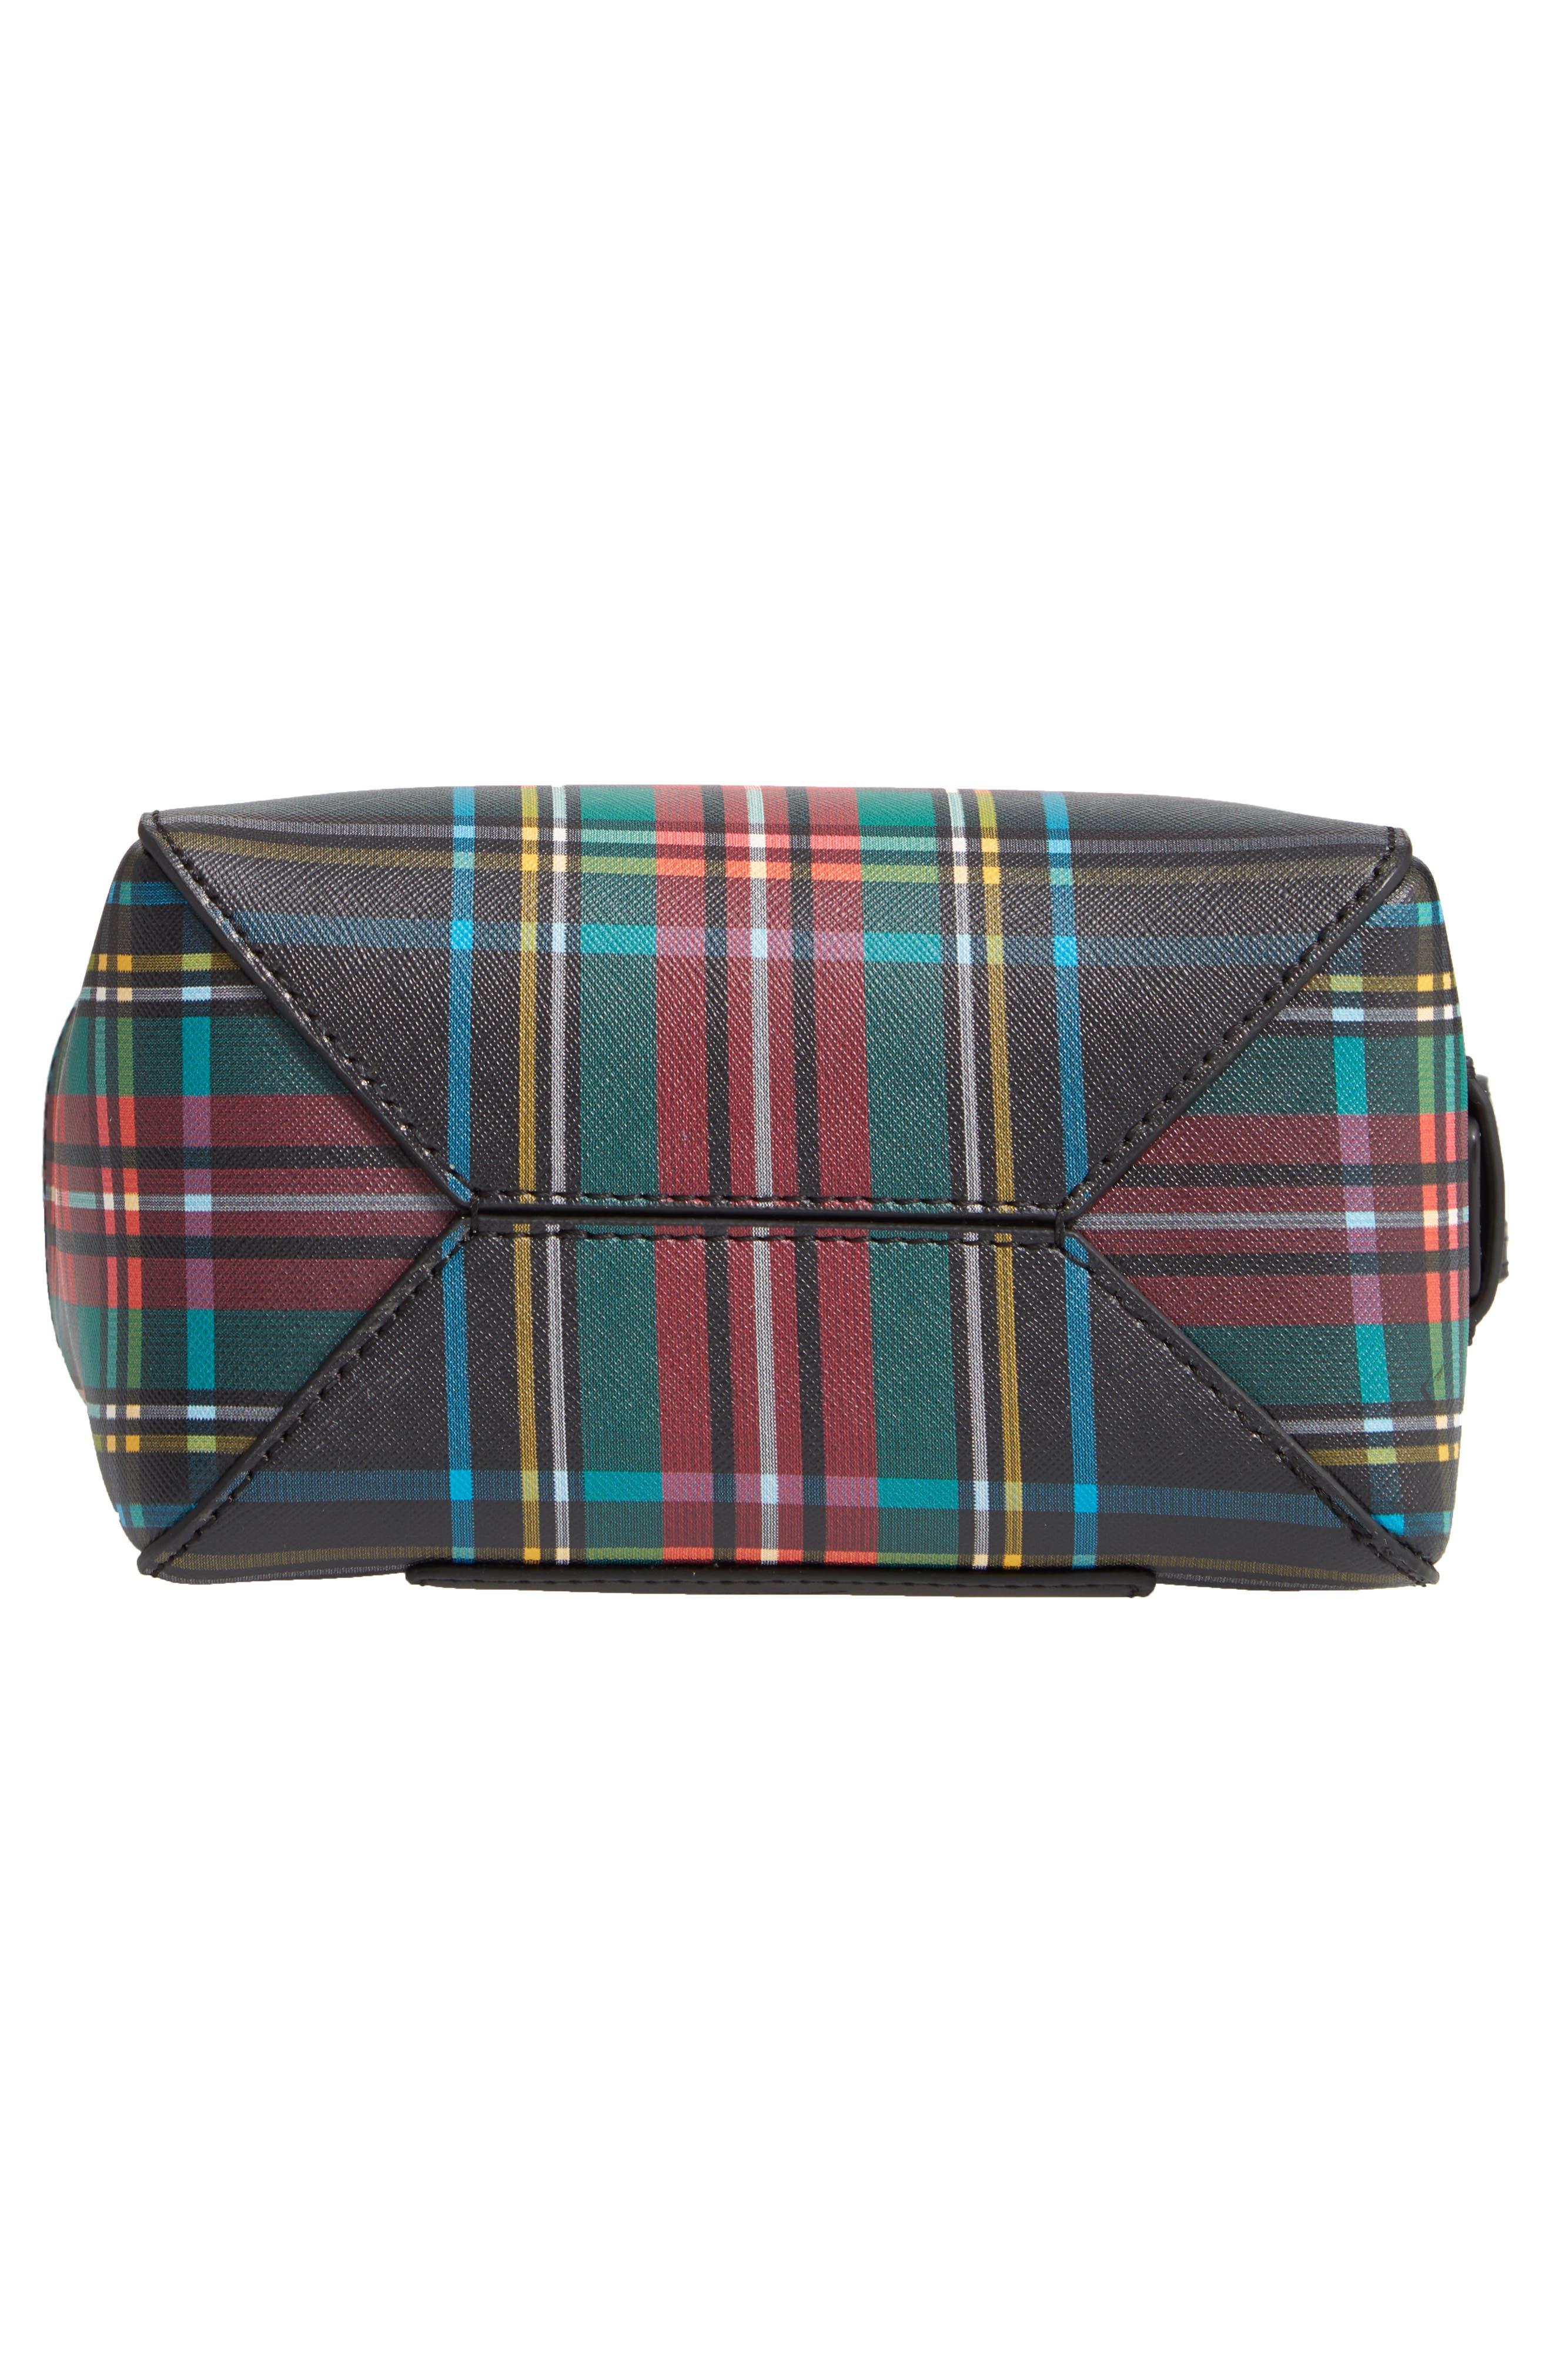 Mini Harper Leather Satchel,                             Alternate thumbnail 6, color,                             BLACK RED MULTI